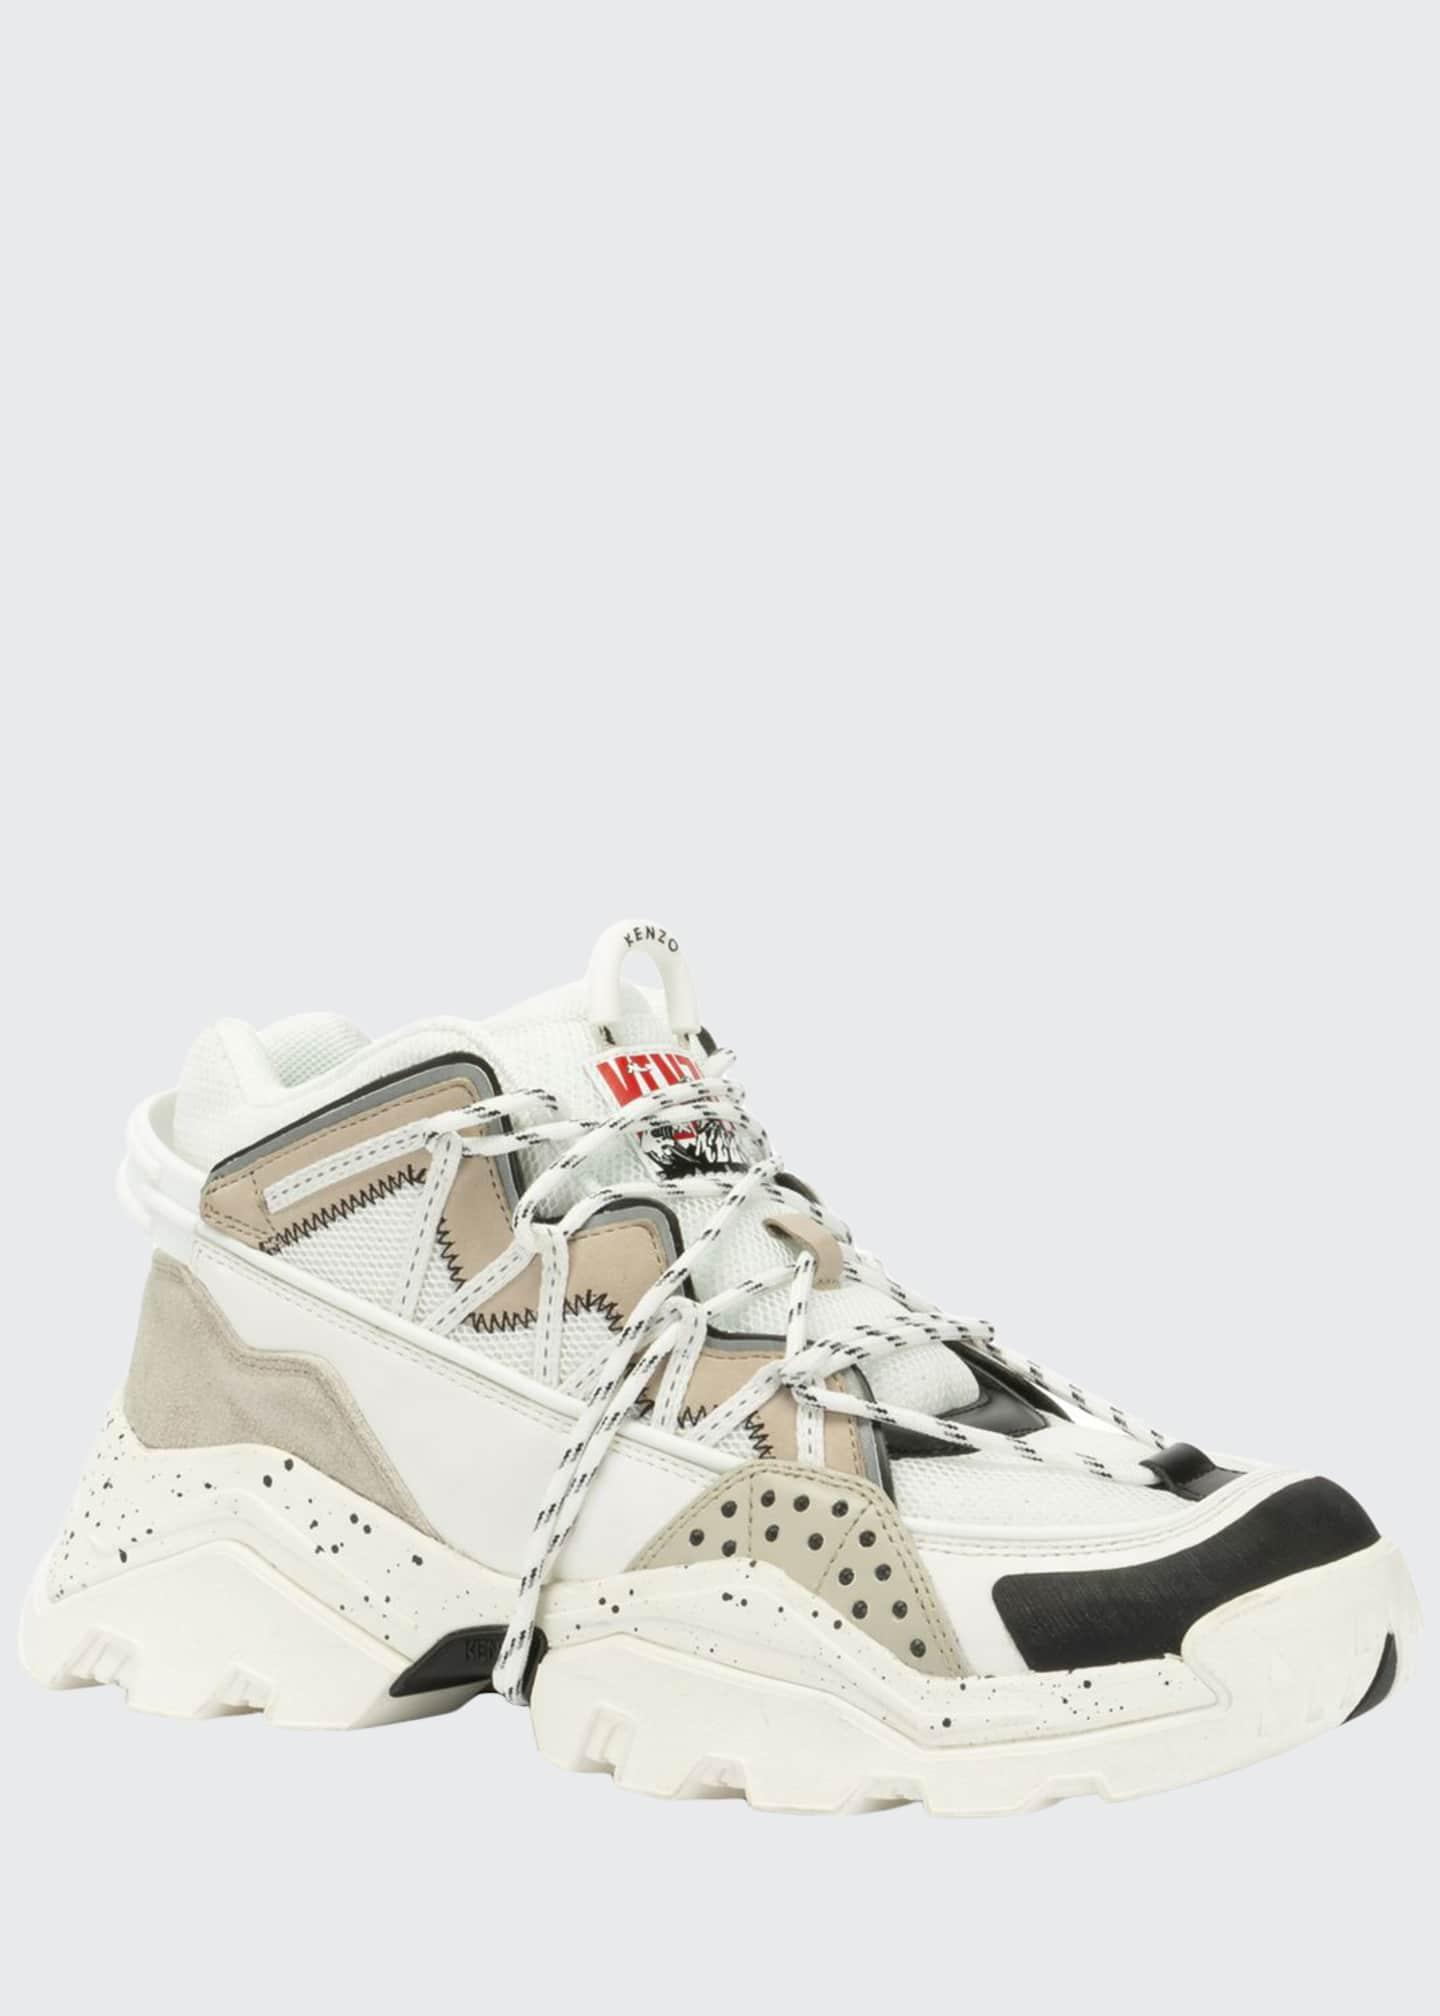 Kenzo Men's Inka Chunky Speckled Wraparound-Lace Sneakers